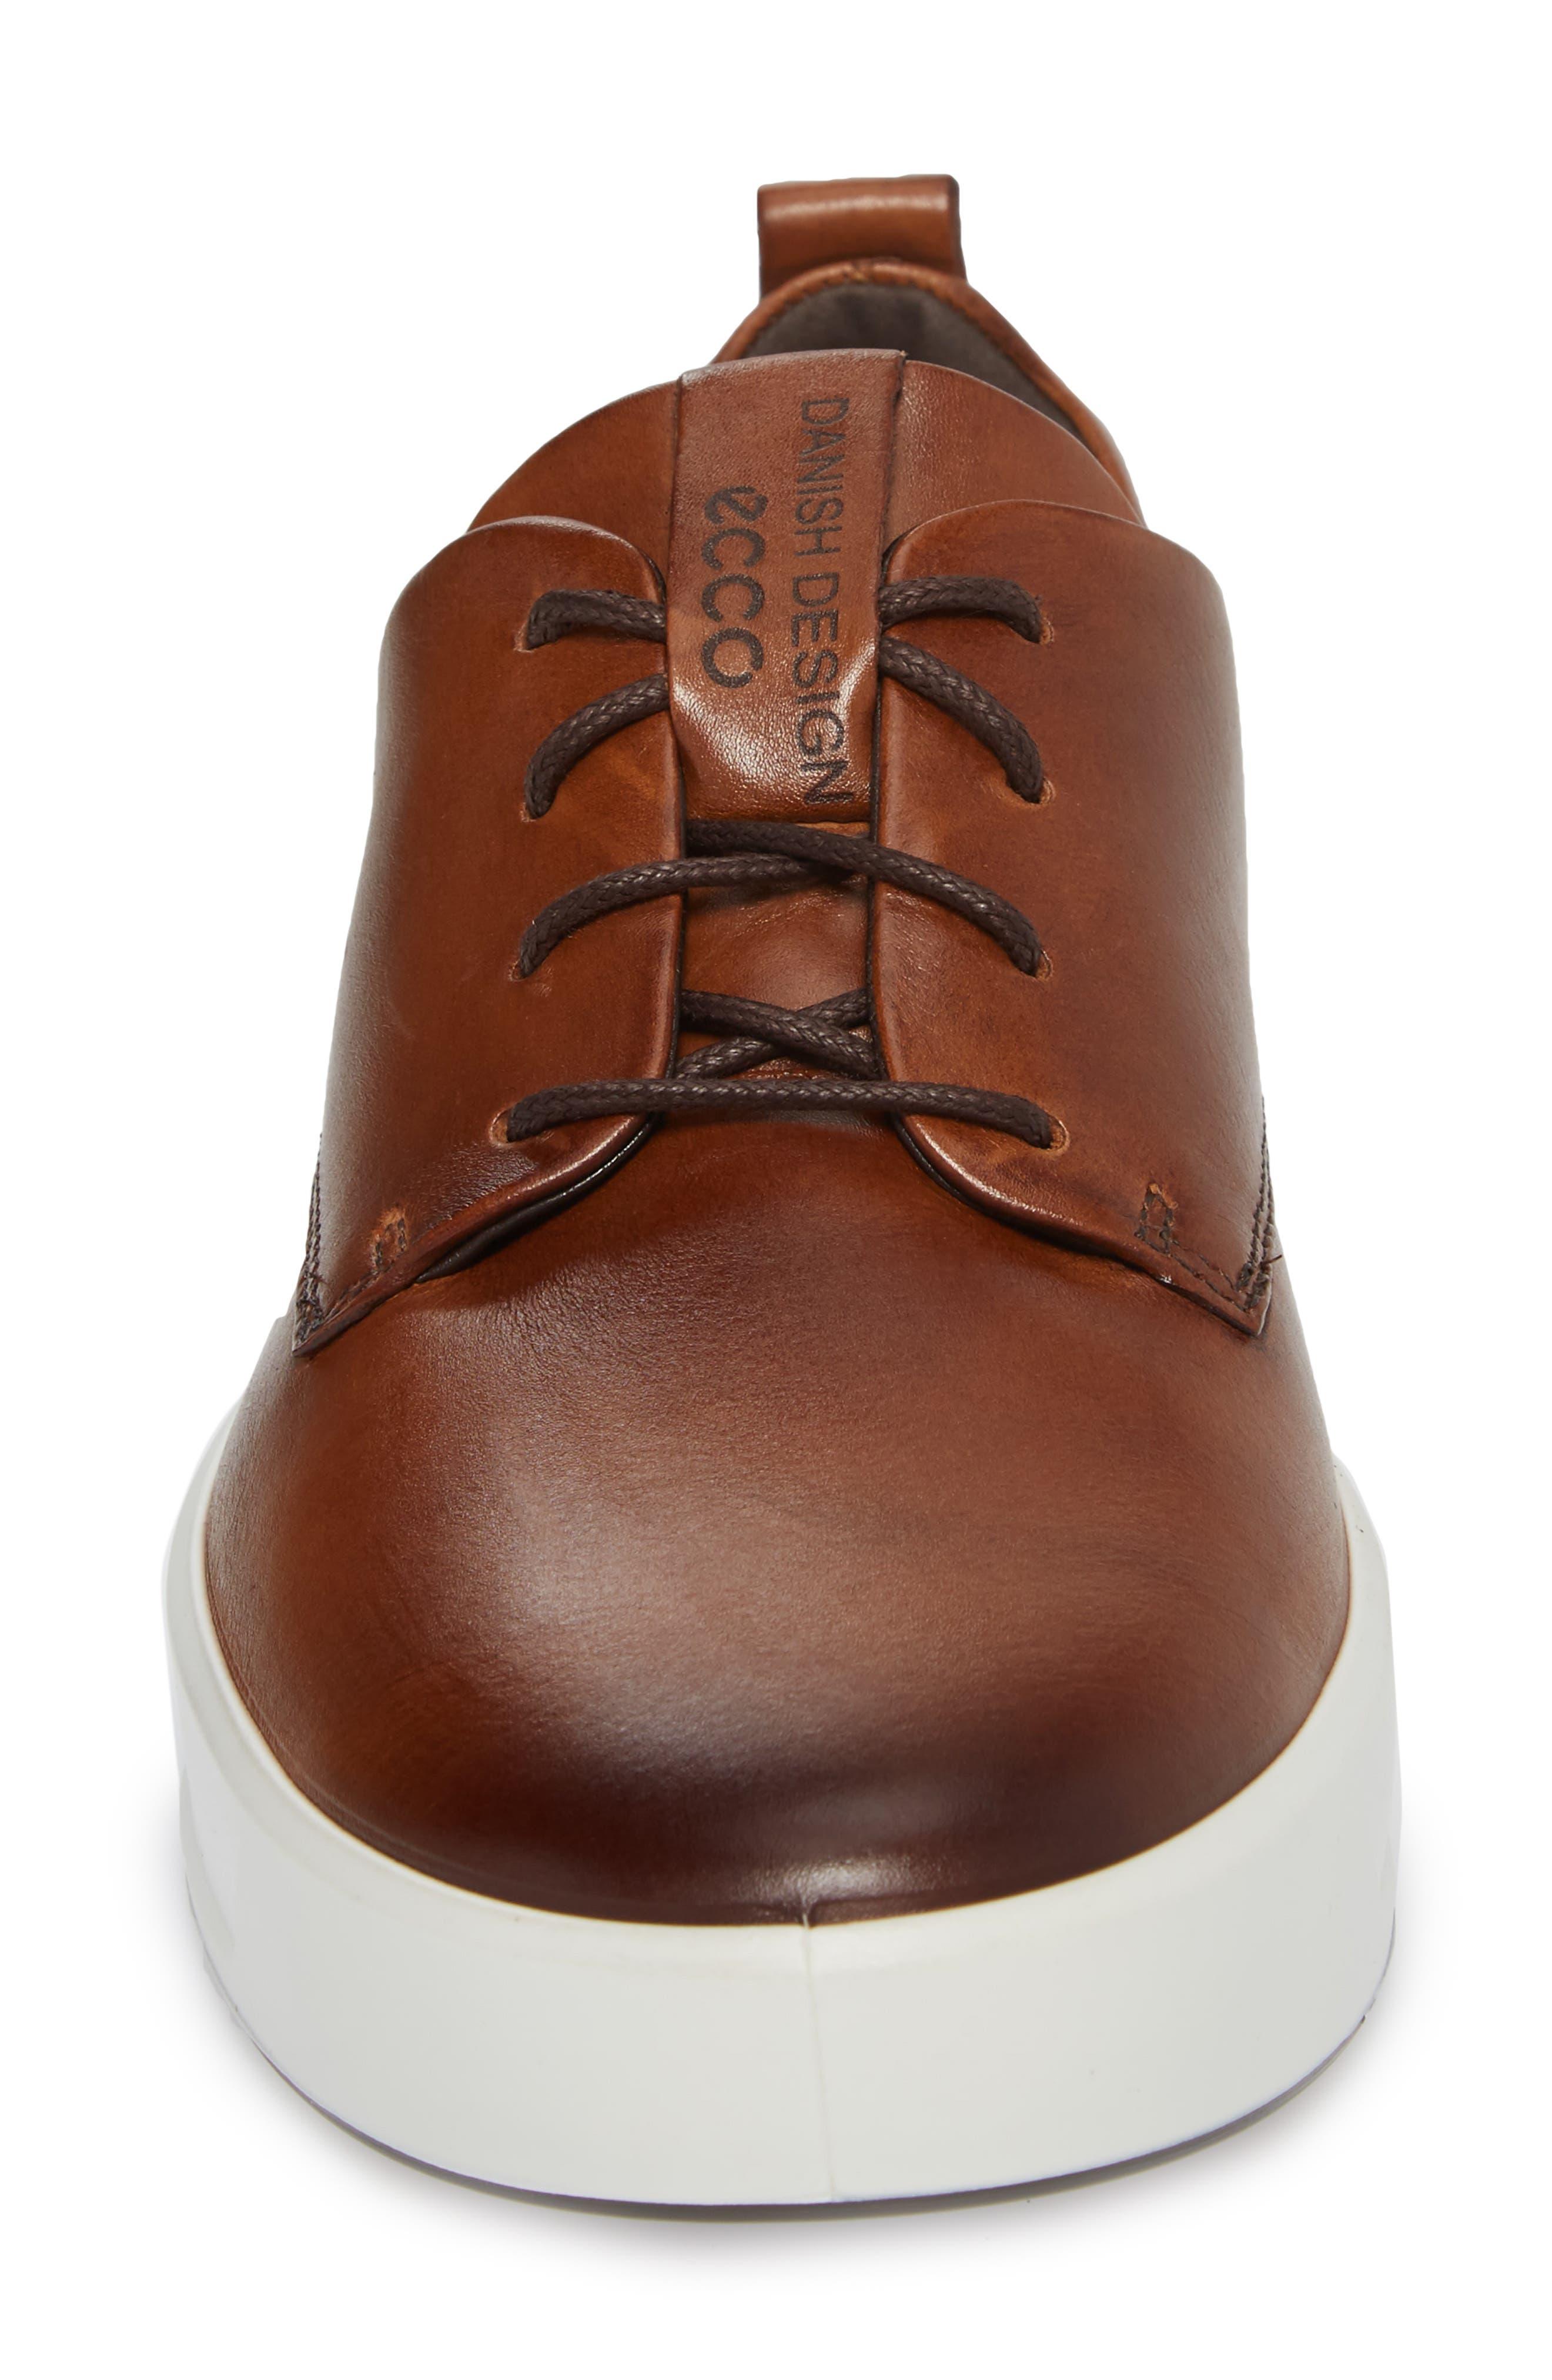 Soft 8 Street Sneaker,                             Alternate thumbnail 4, color,                             LION LEATHER